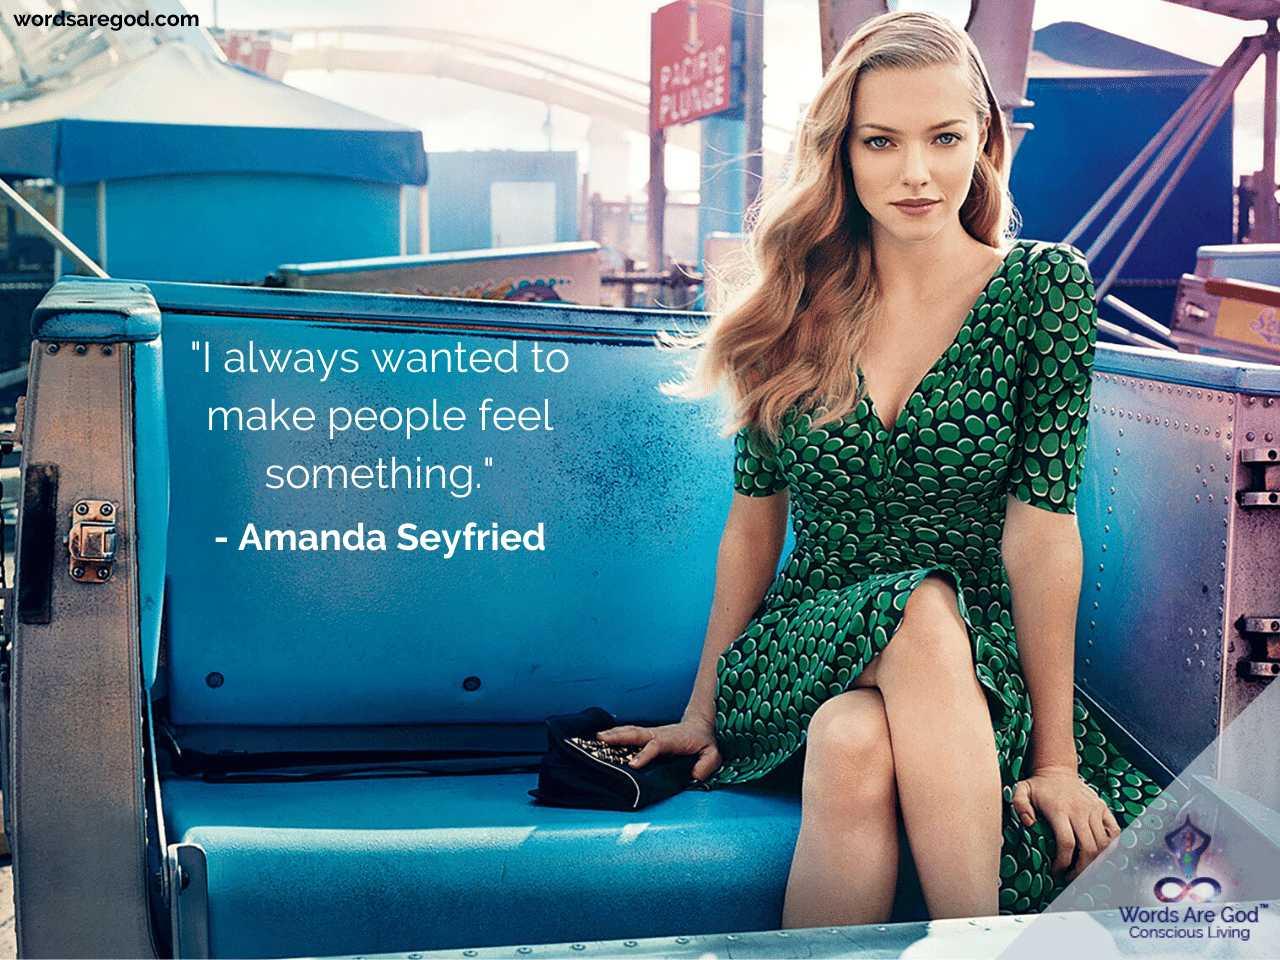 Amanda Seyfried Inspirational Quotes by Amanda Seyfried